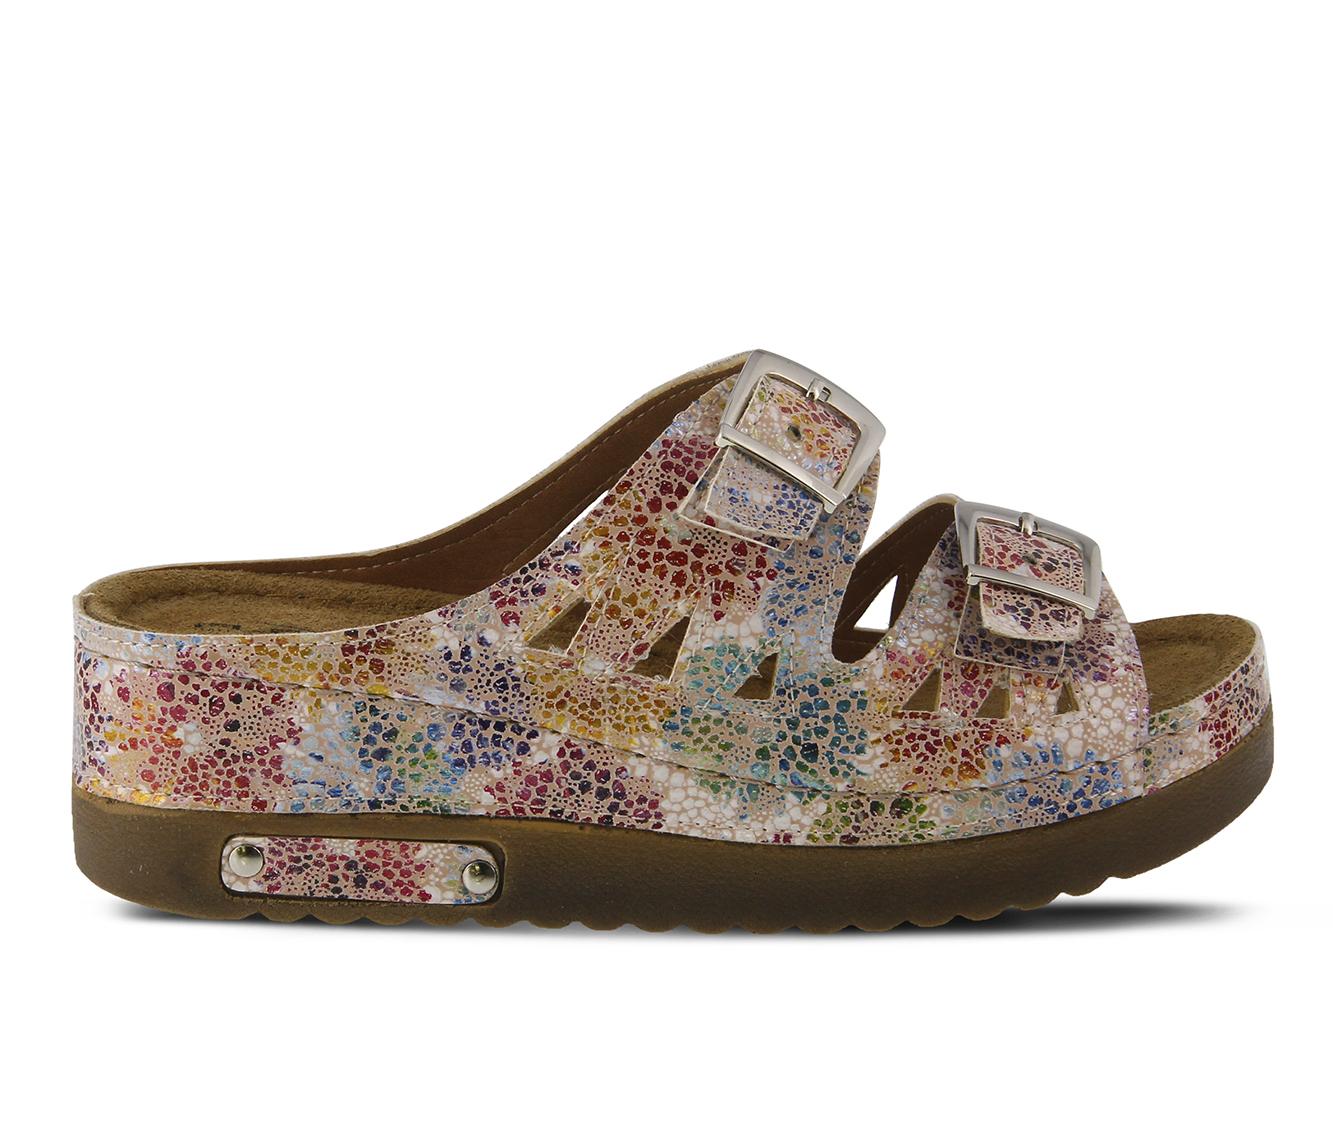 Flexus Delsie Women's Sandal (Pink Faux Leather)